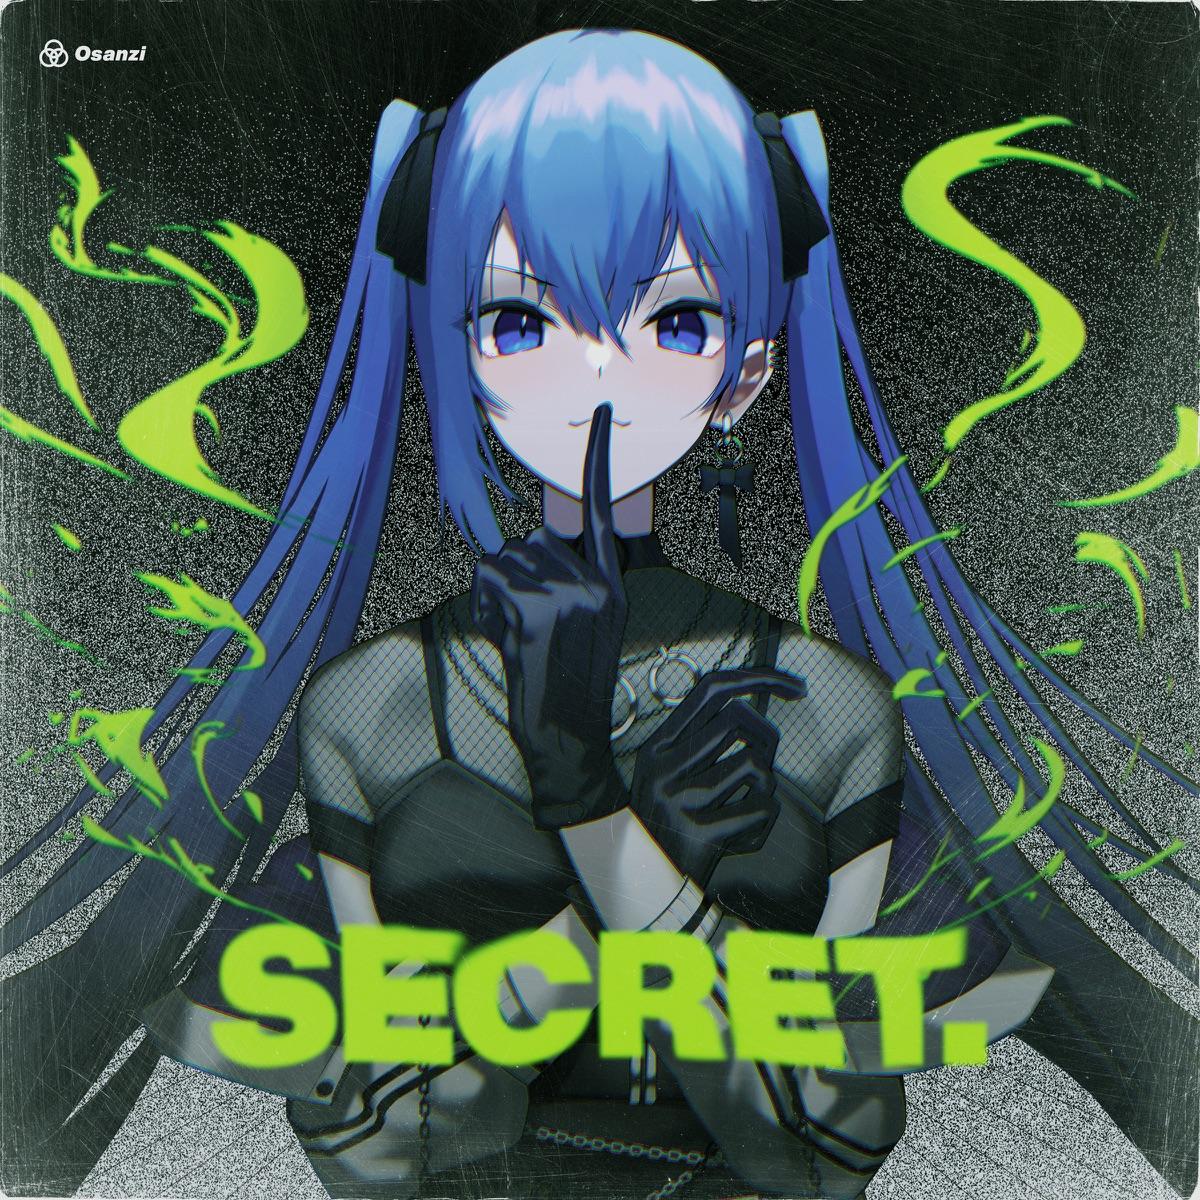 『Osanzi - In Your Eyes』収録の『SECRET.』ジャケット